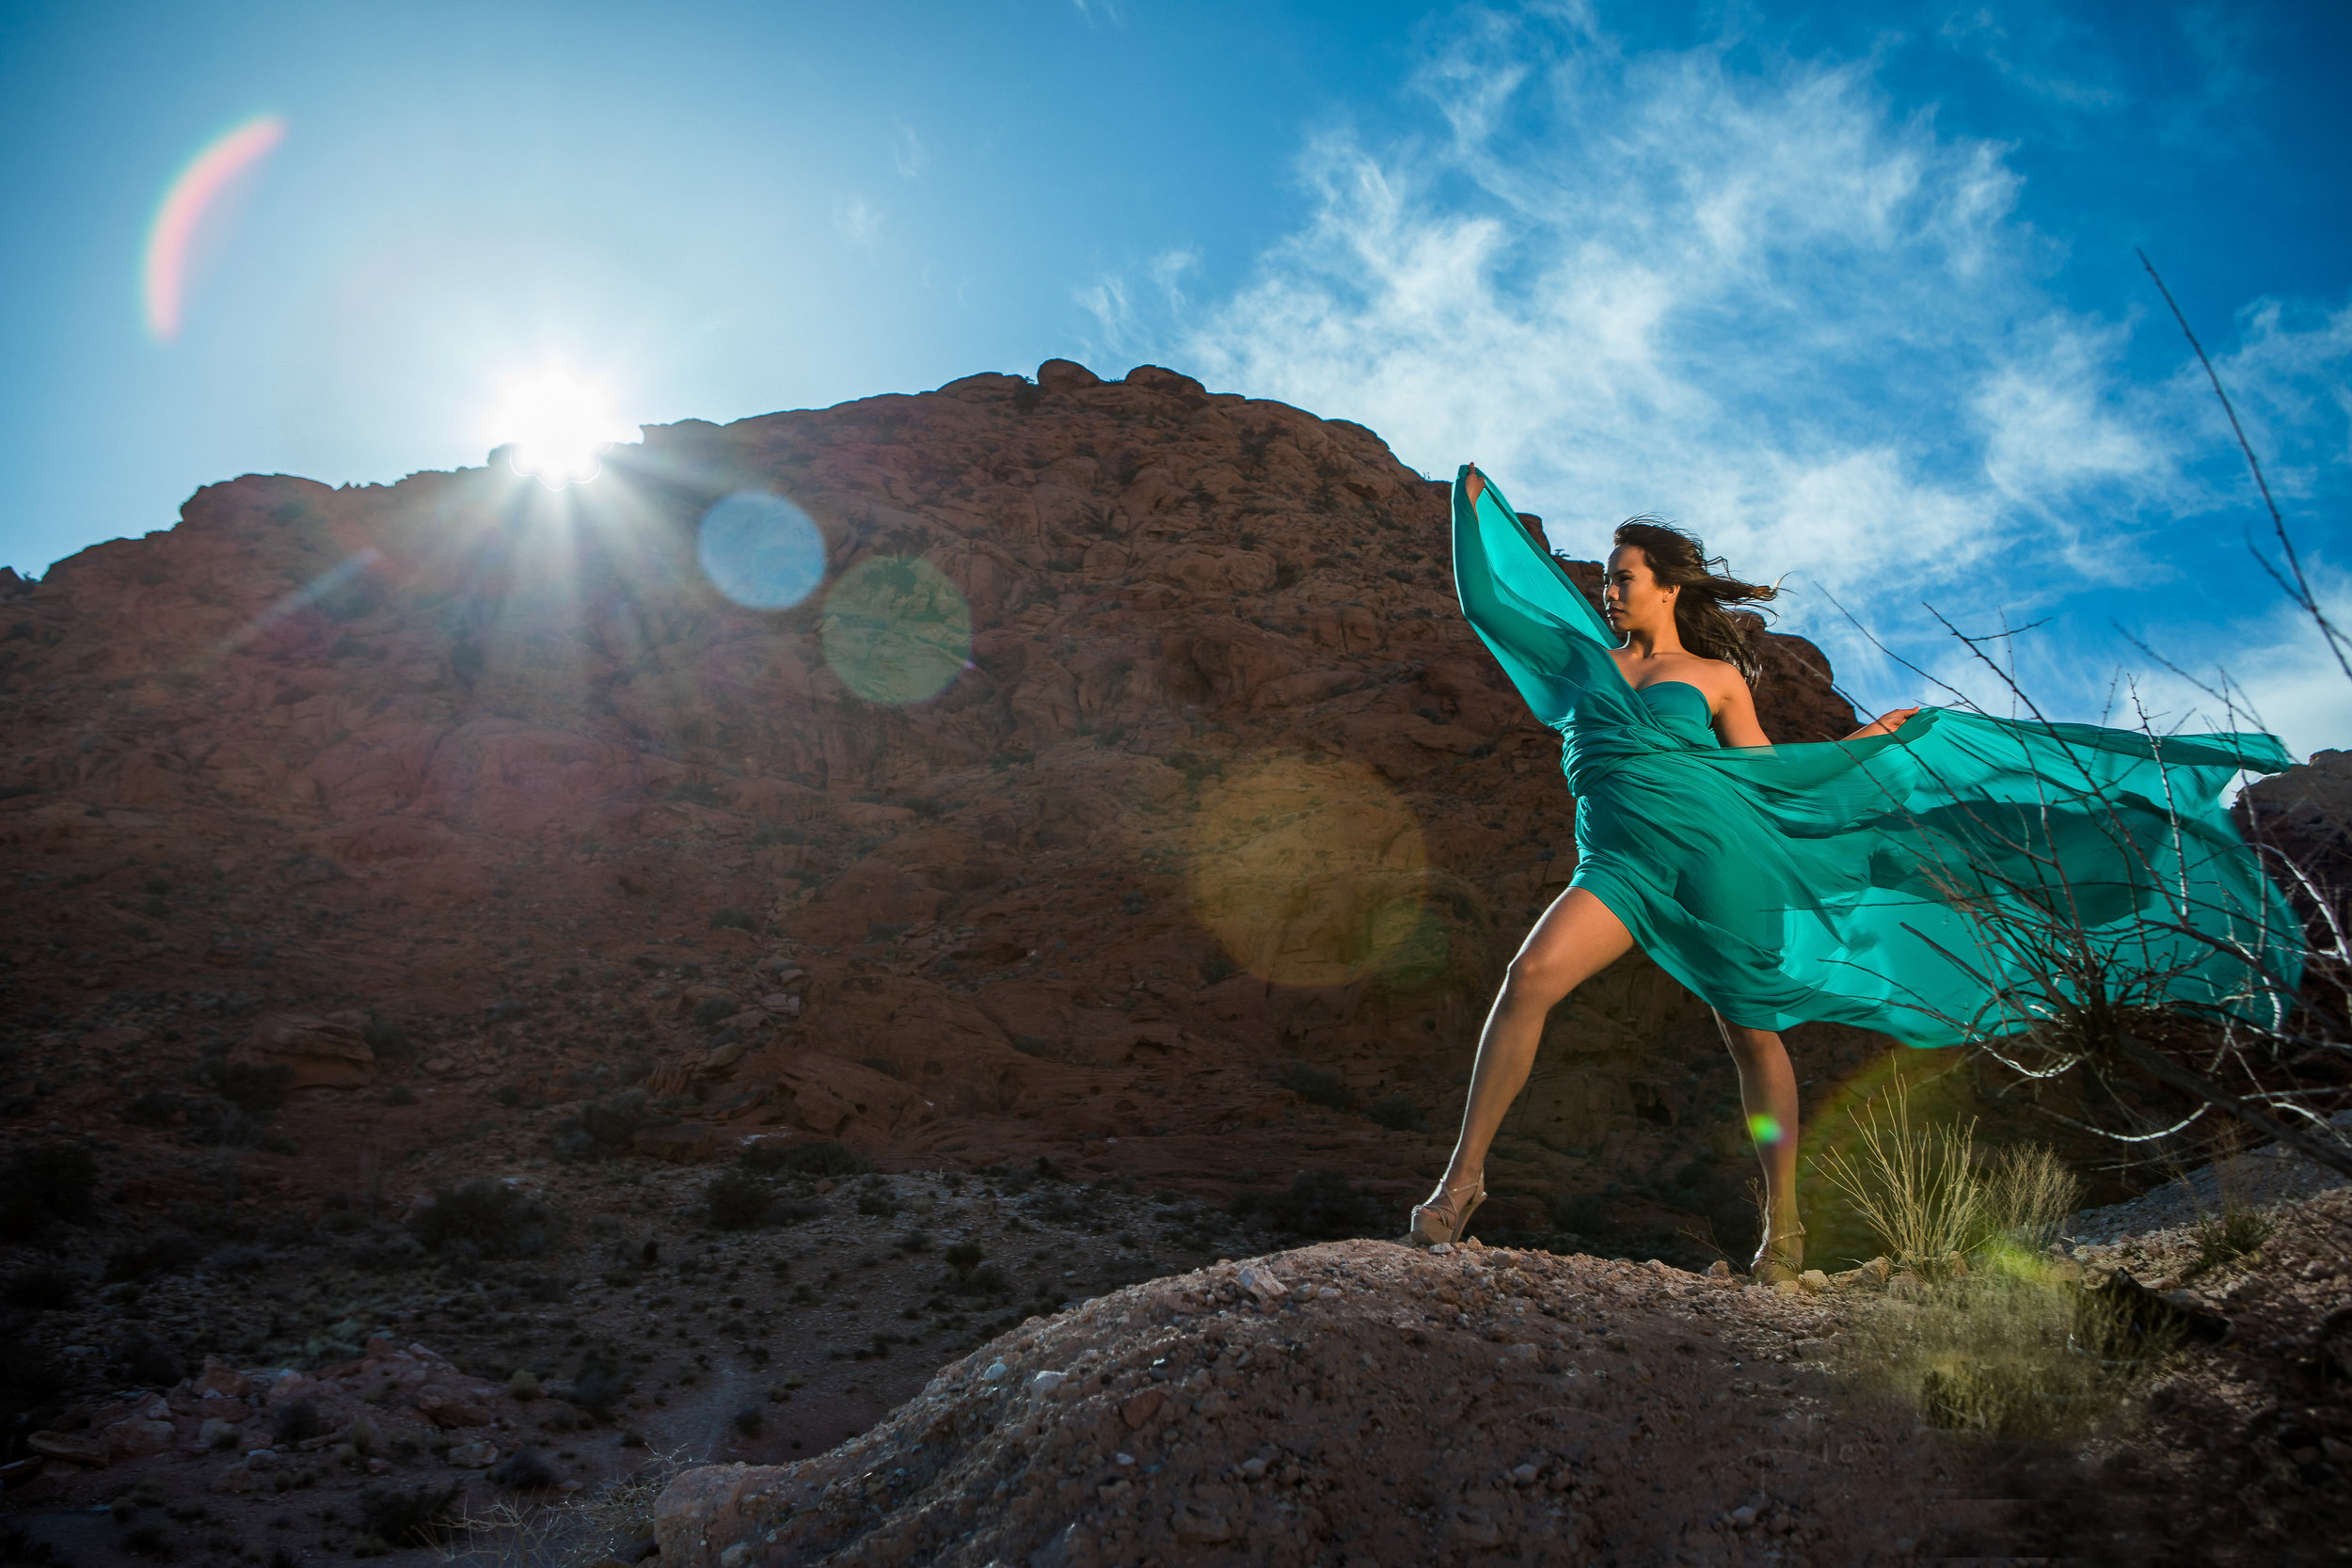 New_York_Photographer_Las_Vegas_Desert-19.jpg